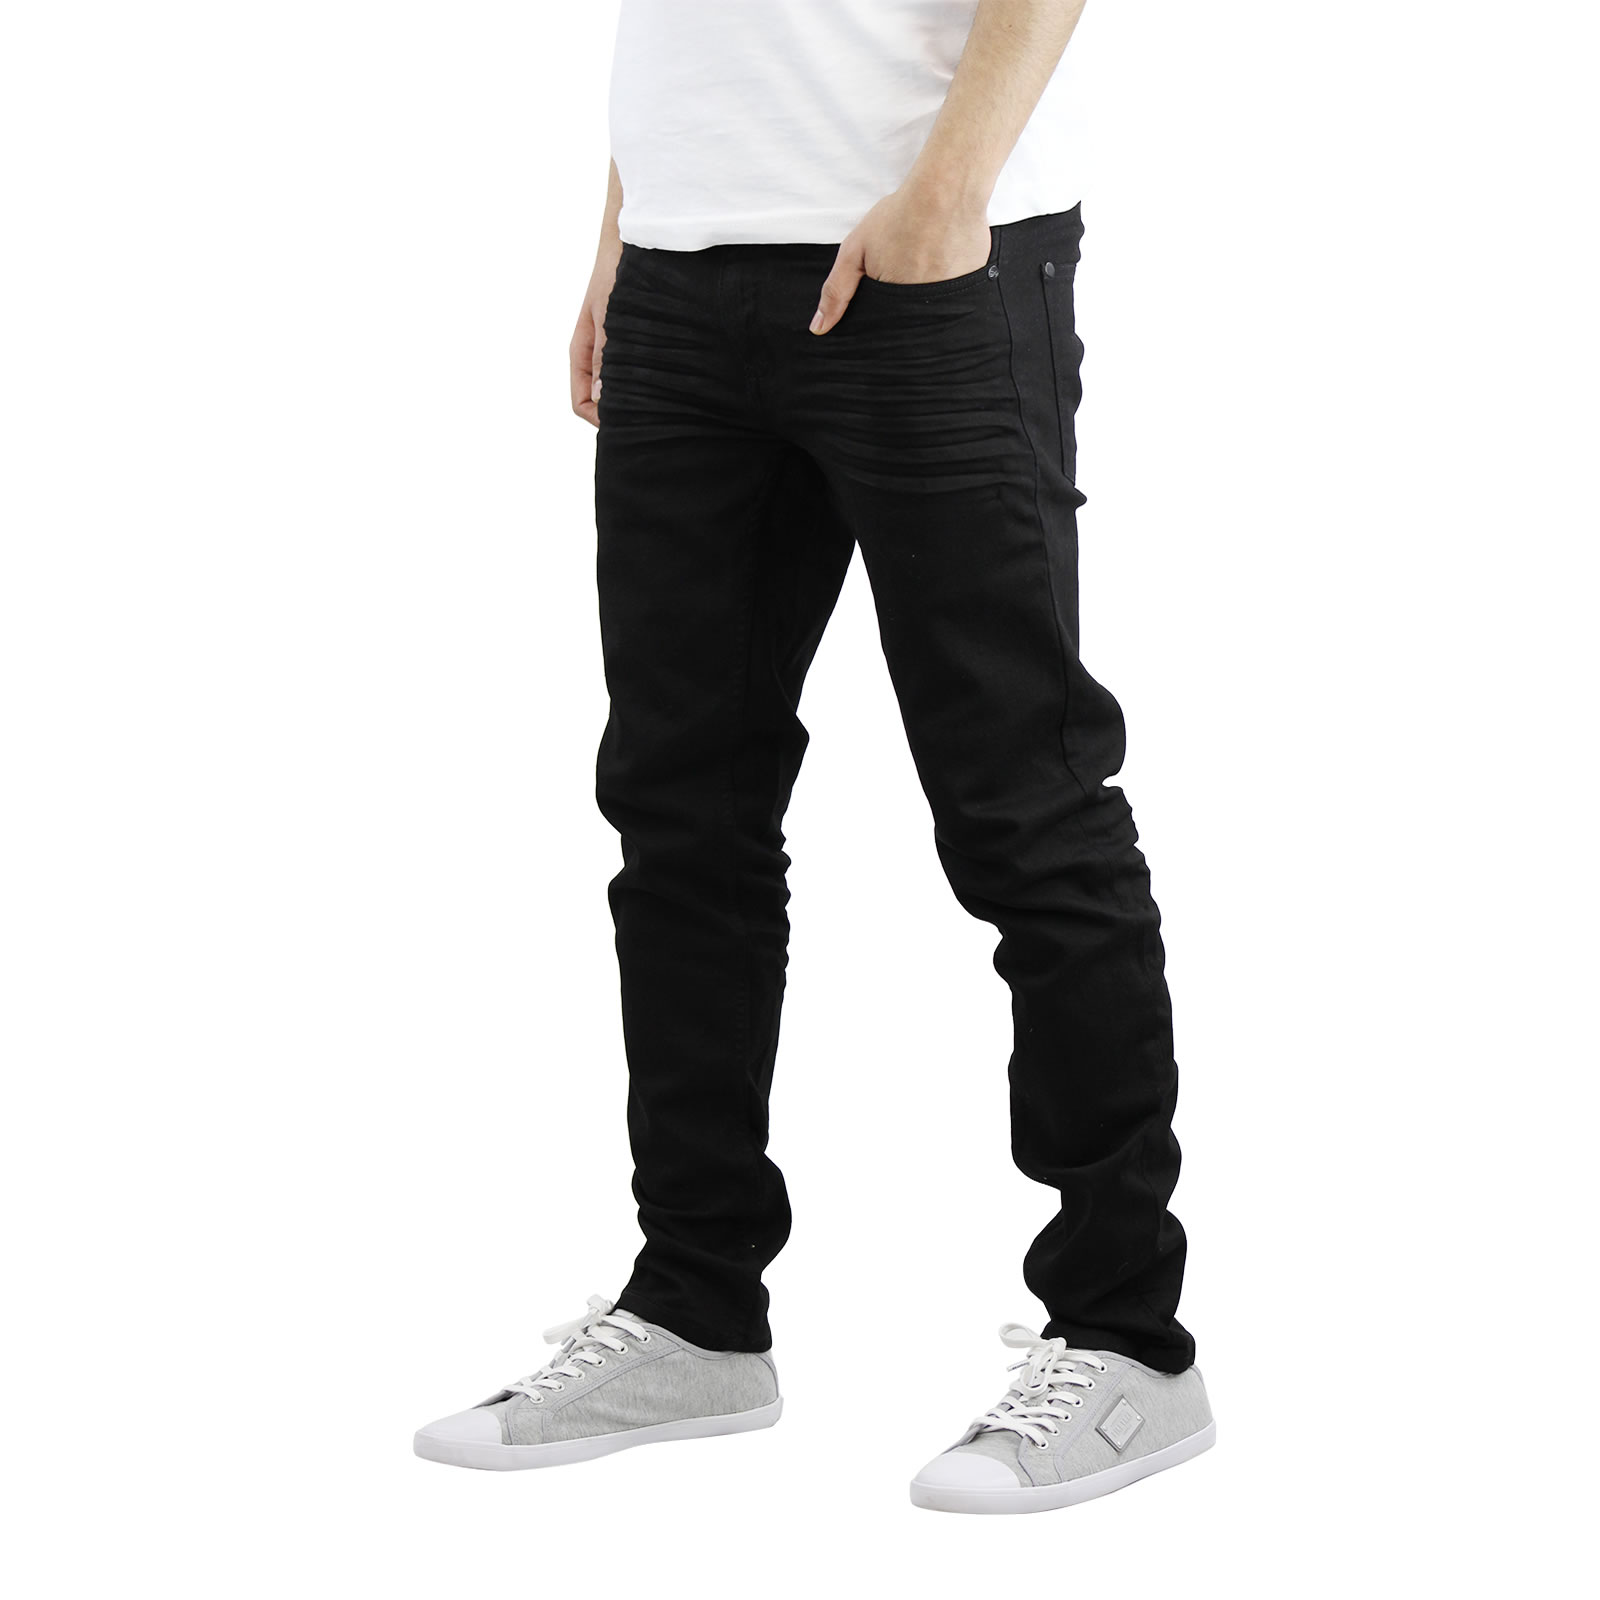 miniature 3 - Homme Crosshatch Jaco Slim Jeans stretch pantalon denim effet vieilli